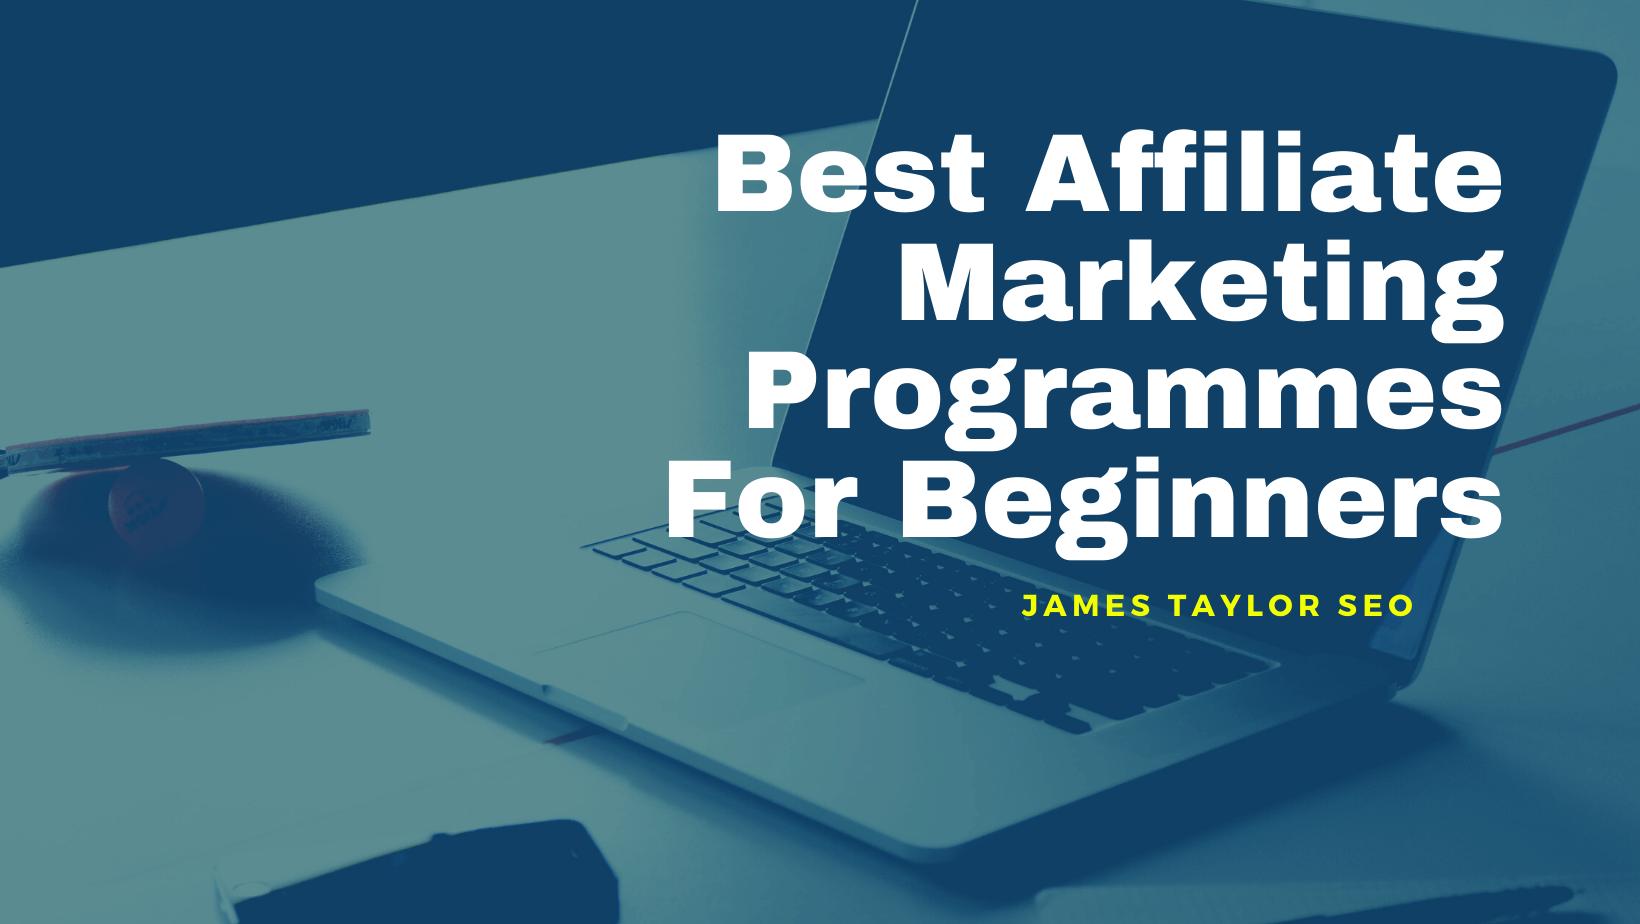 Best Affiliate Marketing Programmes For Beginners